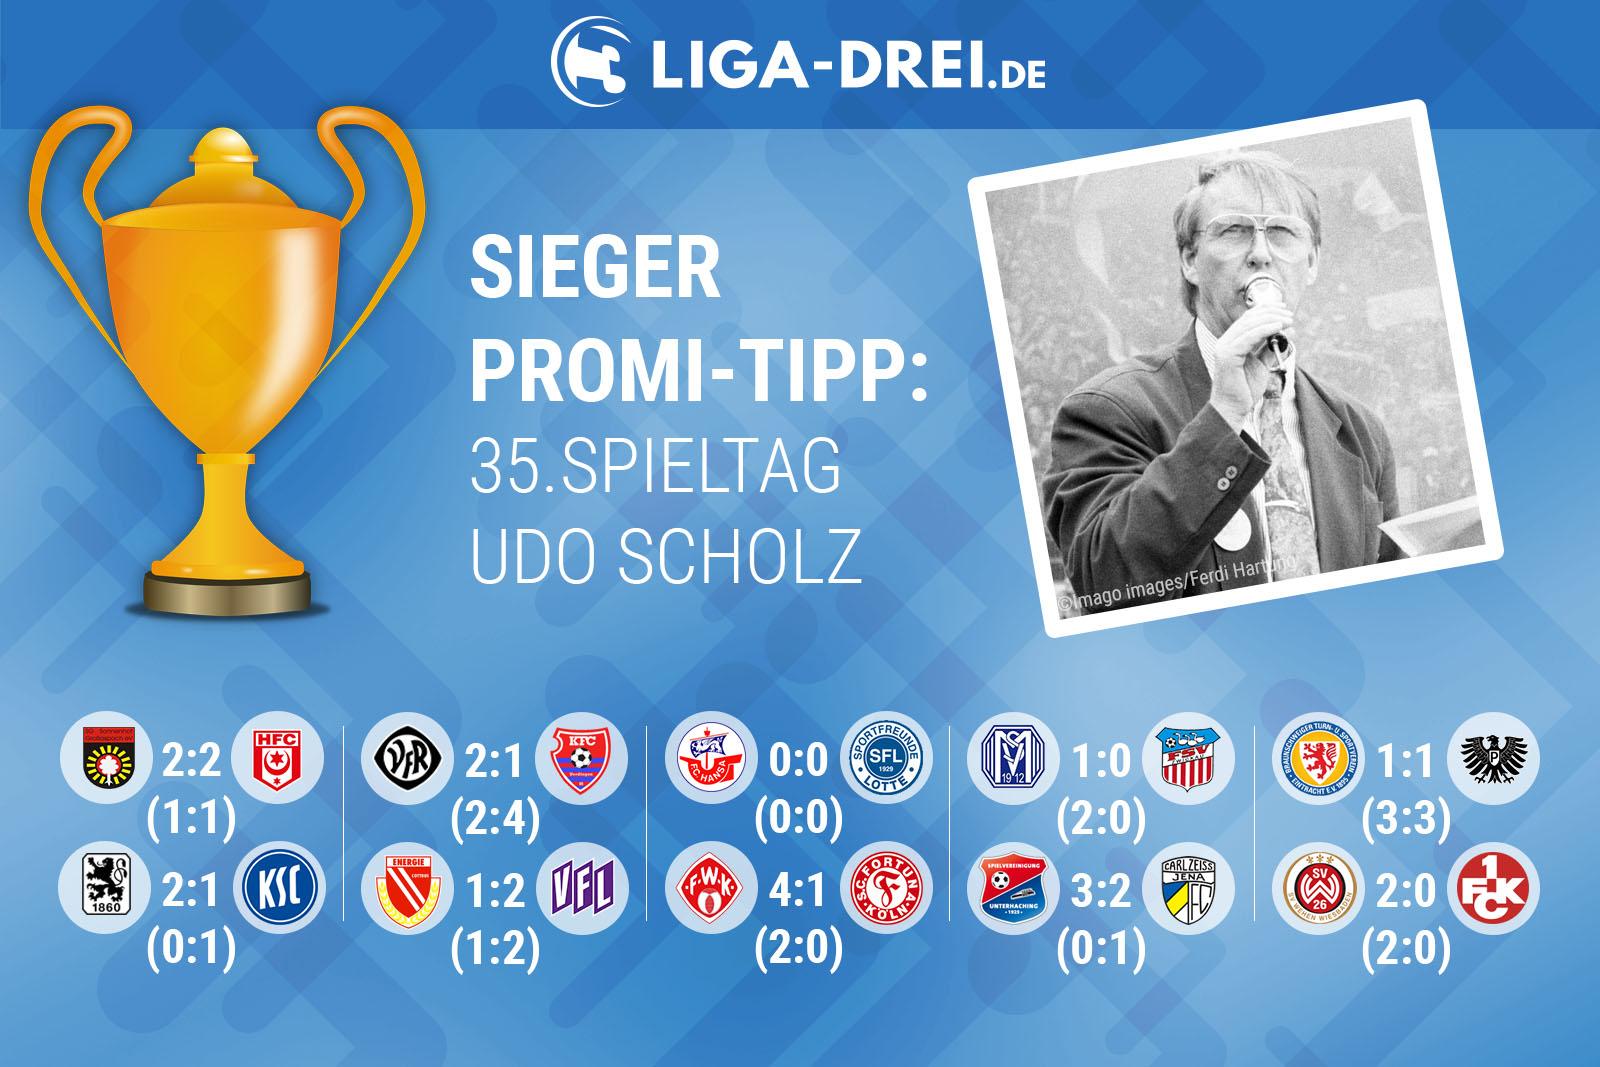 Udo Scholz beim Promi-Tipp